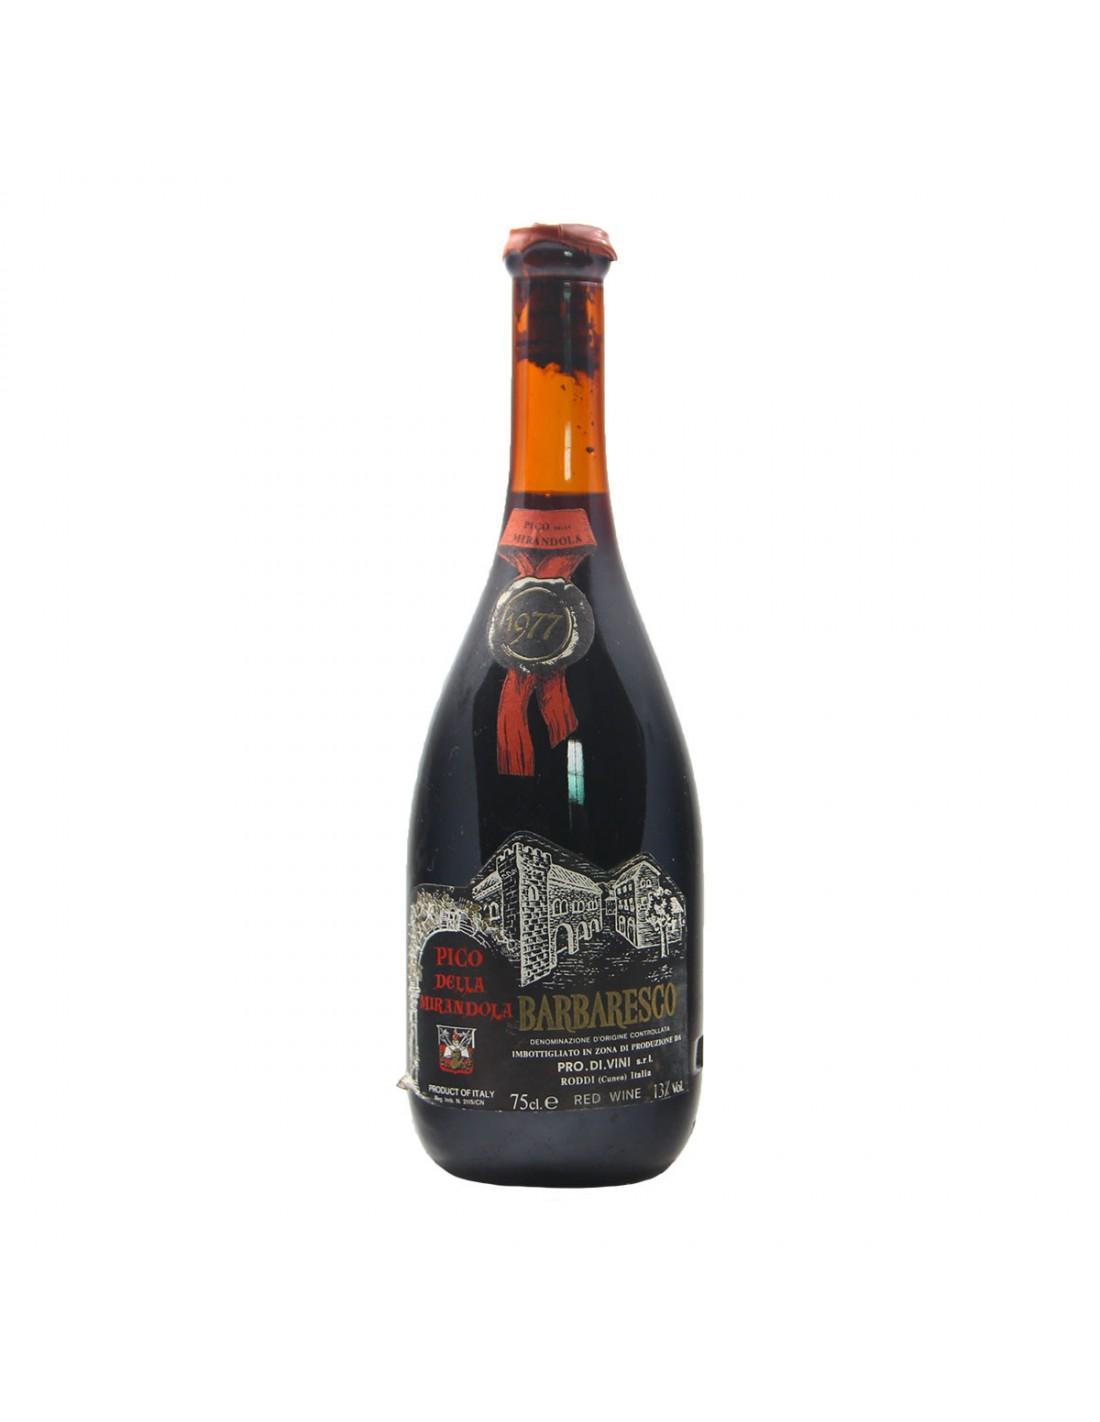 BARBARESCO 1977 PICO DELLA MIRANDOLA Grandi Bottiglie